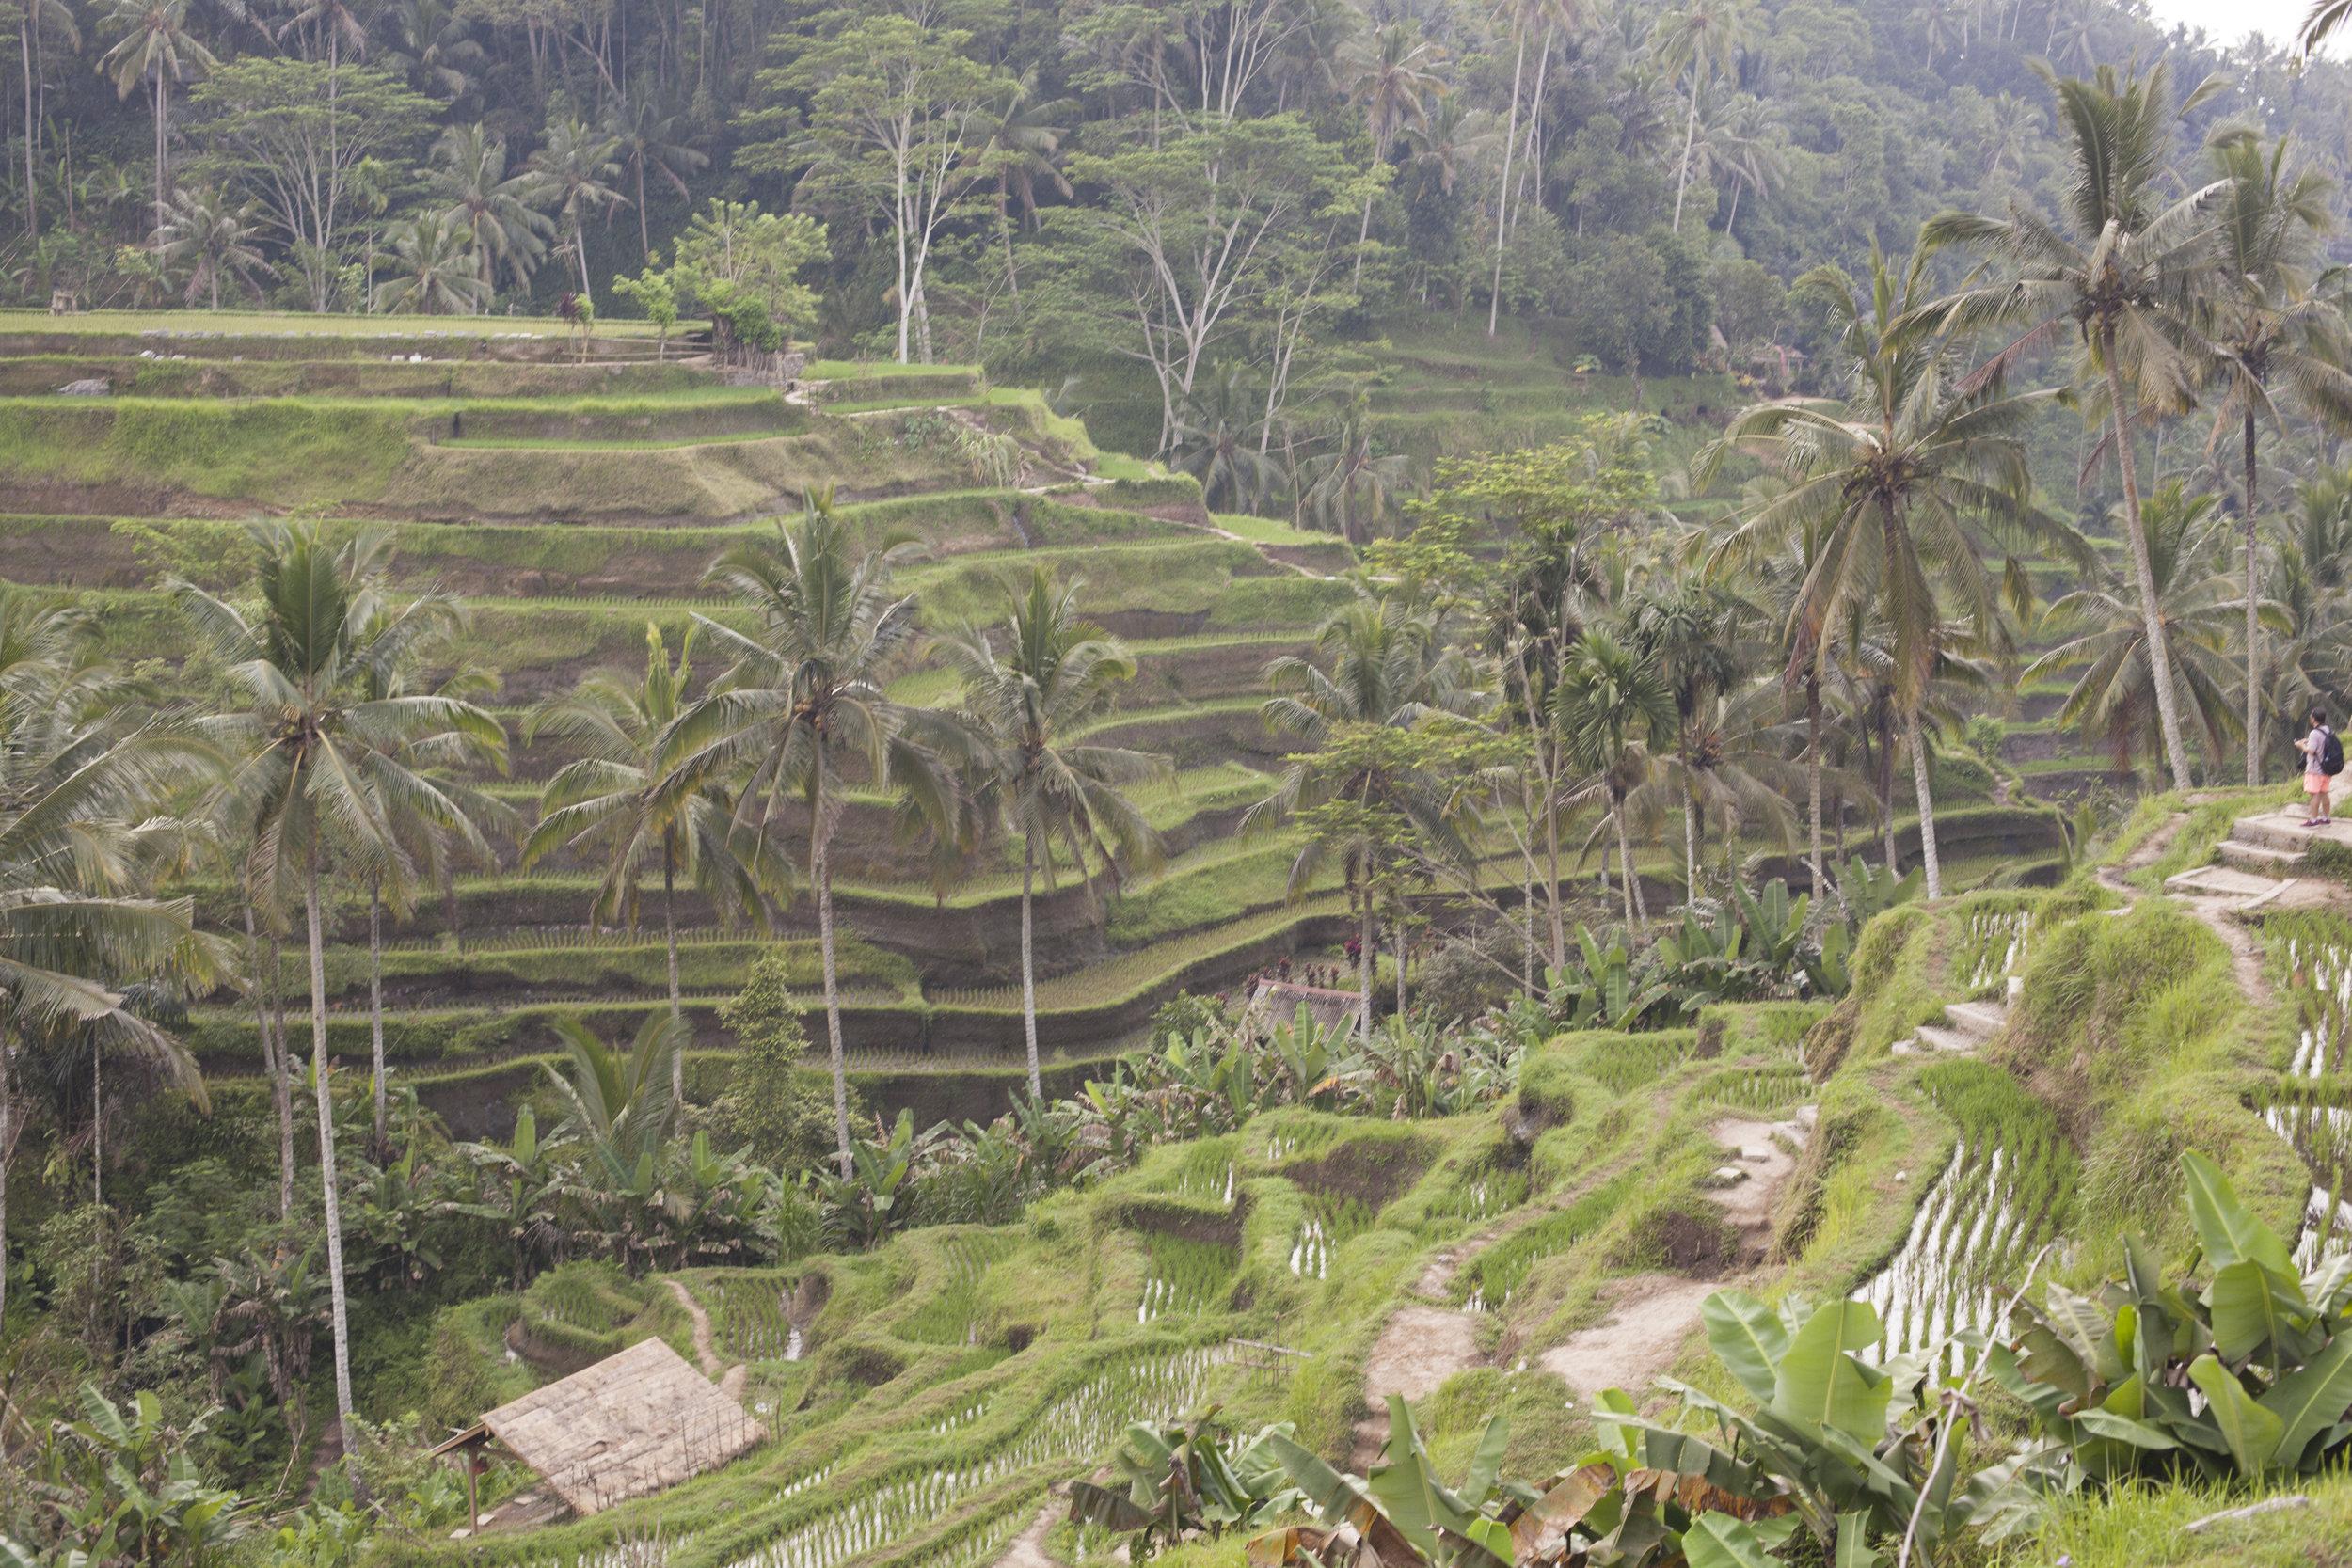 Rice Fields, Bali Indonesia